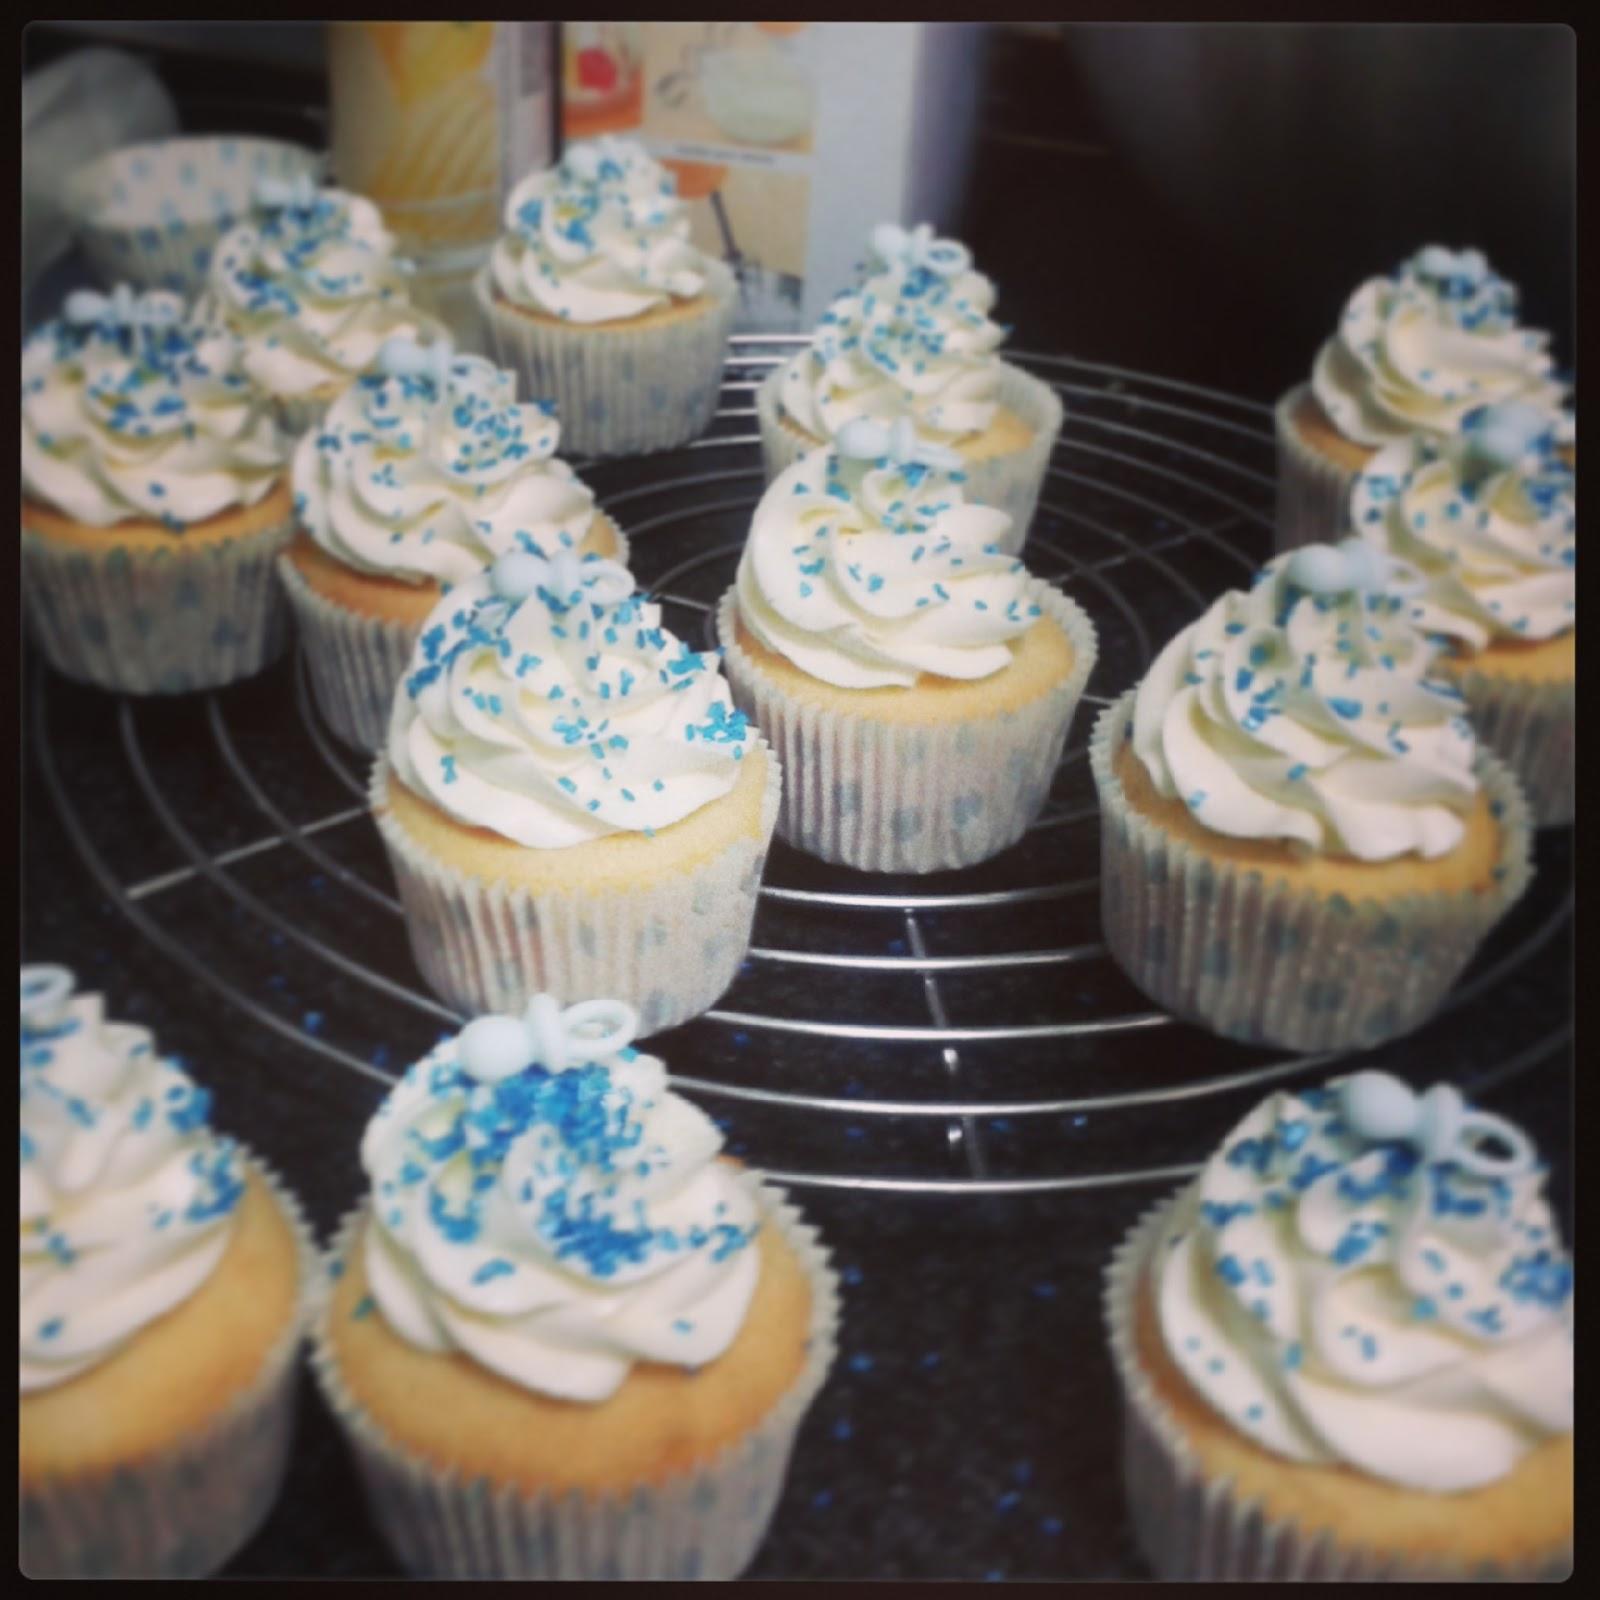 La dulce ratatouille cupcakes angel food cake para bautizo for Decoracion en cupcakes